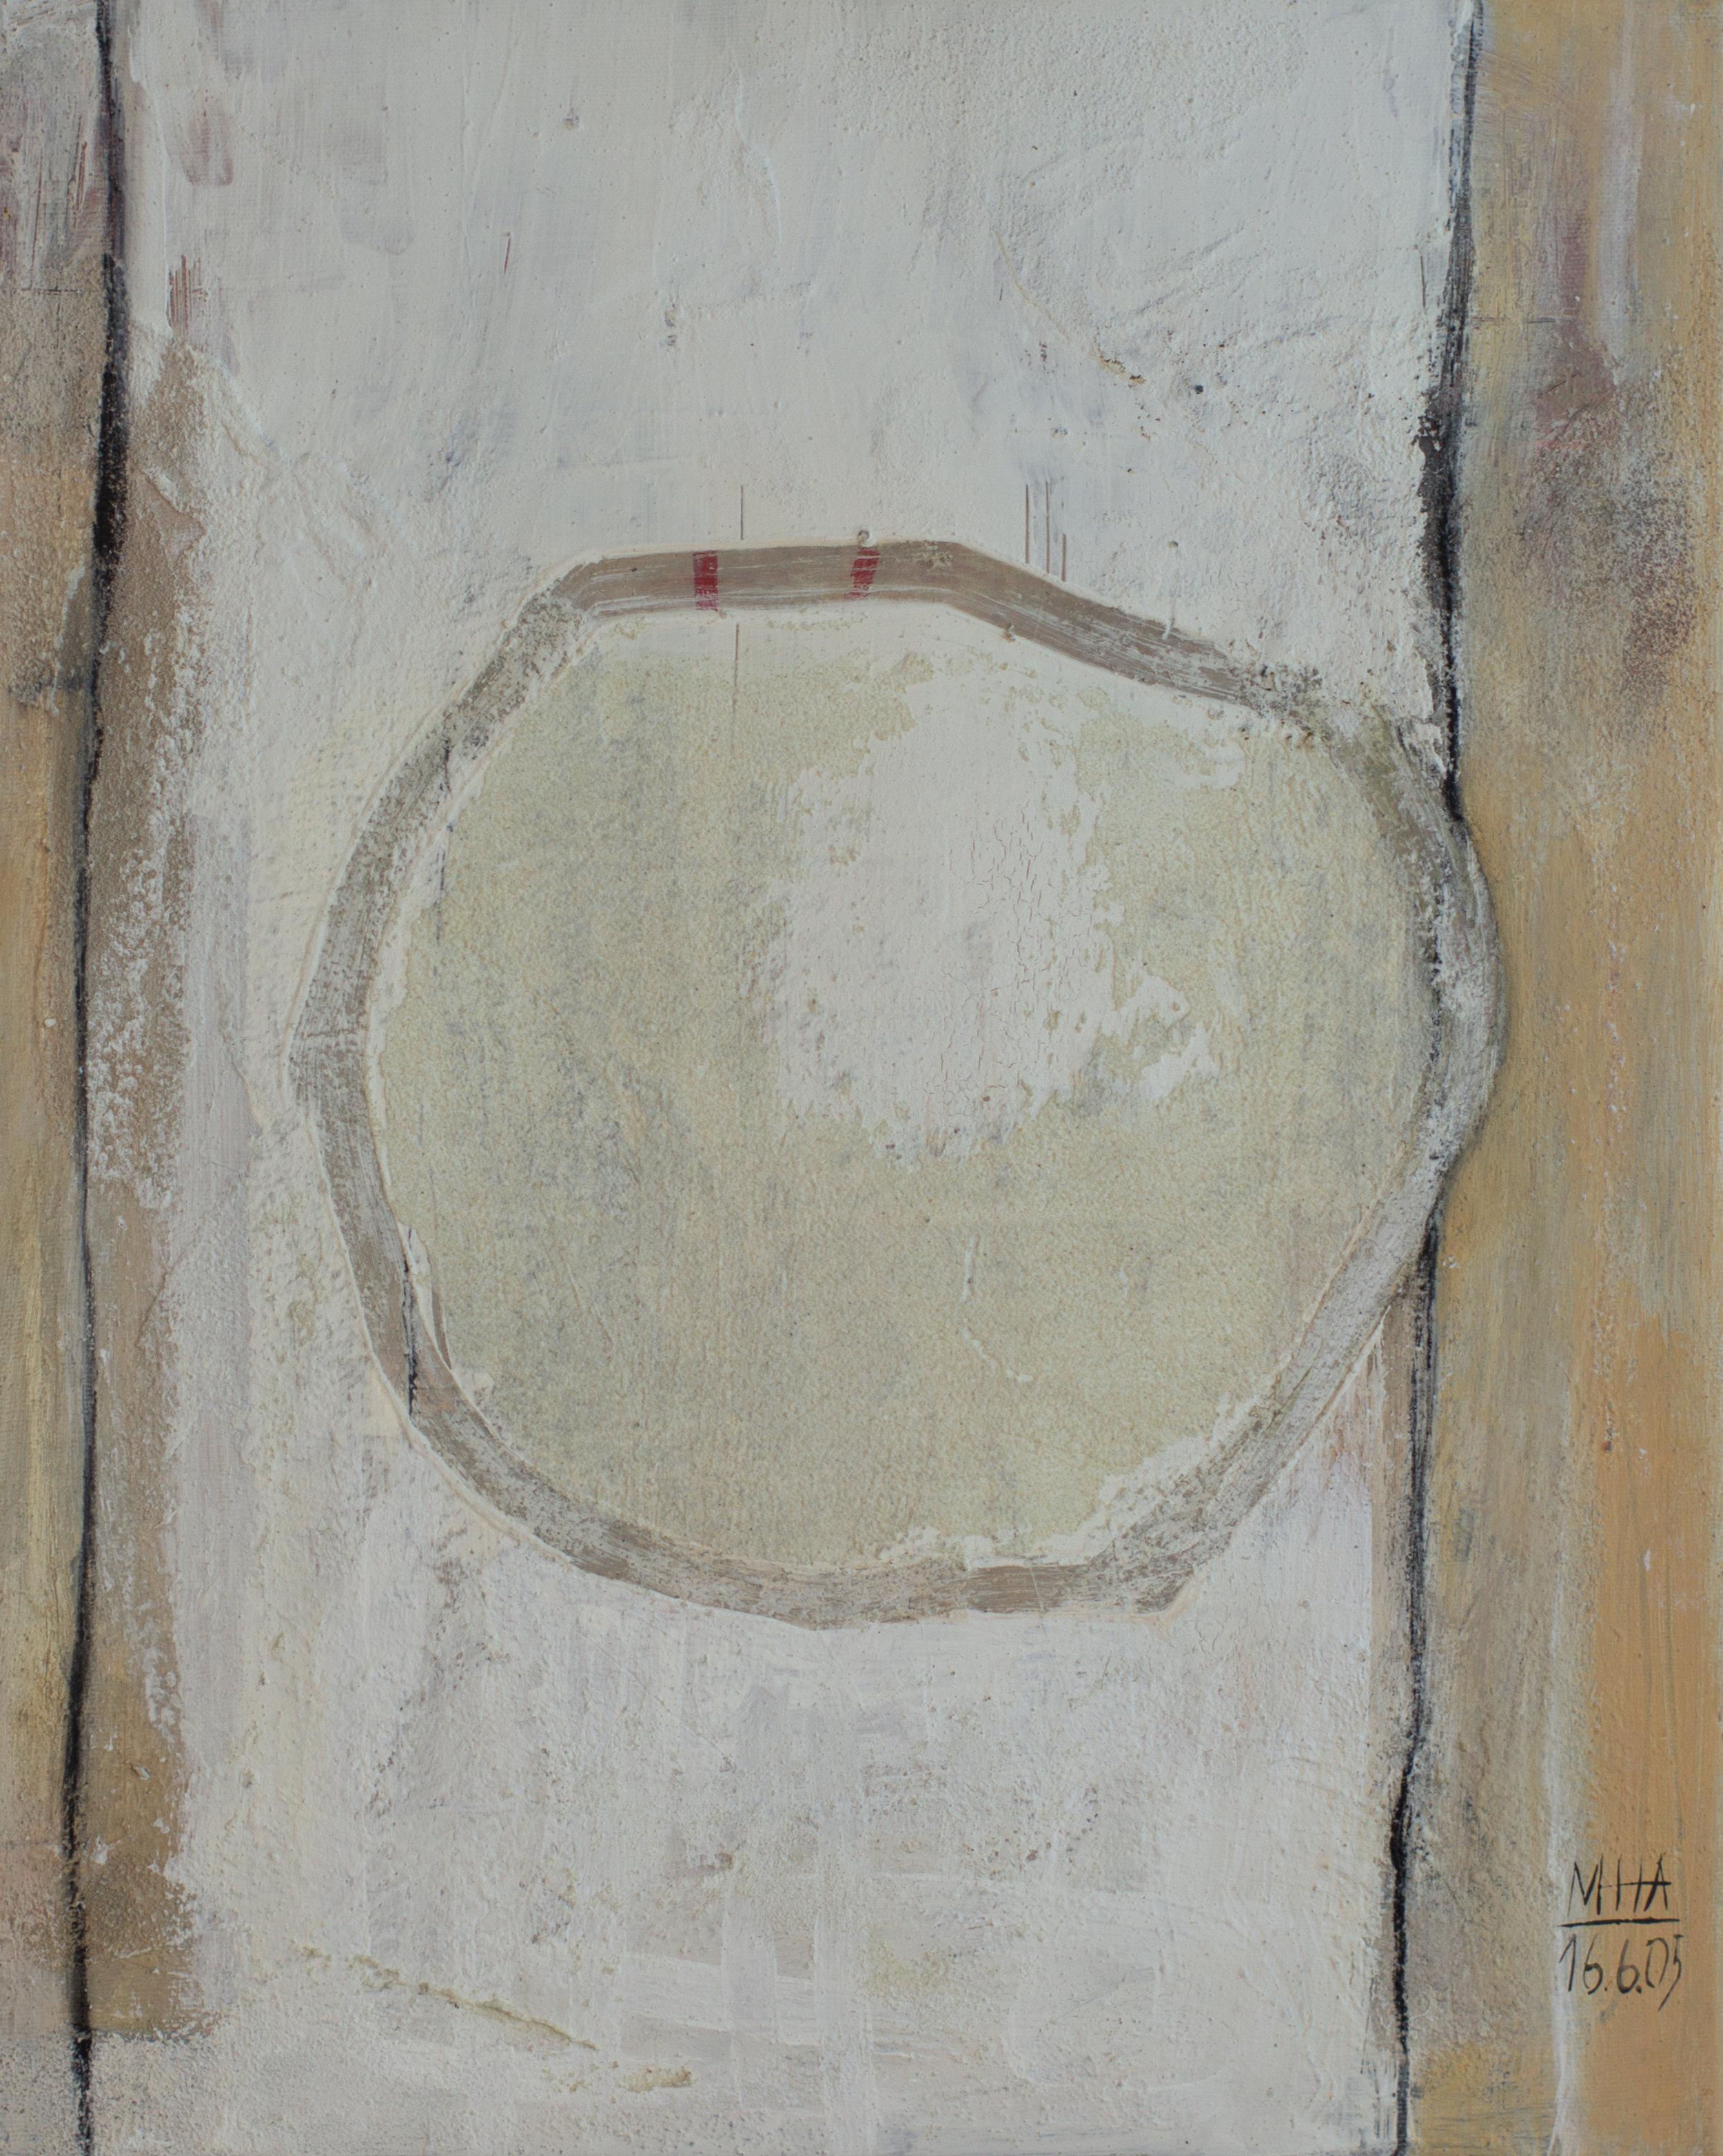 Kreis 16 , 2005,Acryl auf Leinwand - Mischtechnik, 100x120 cm